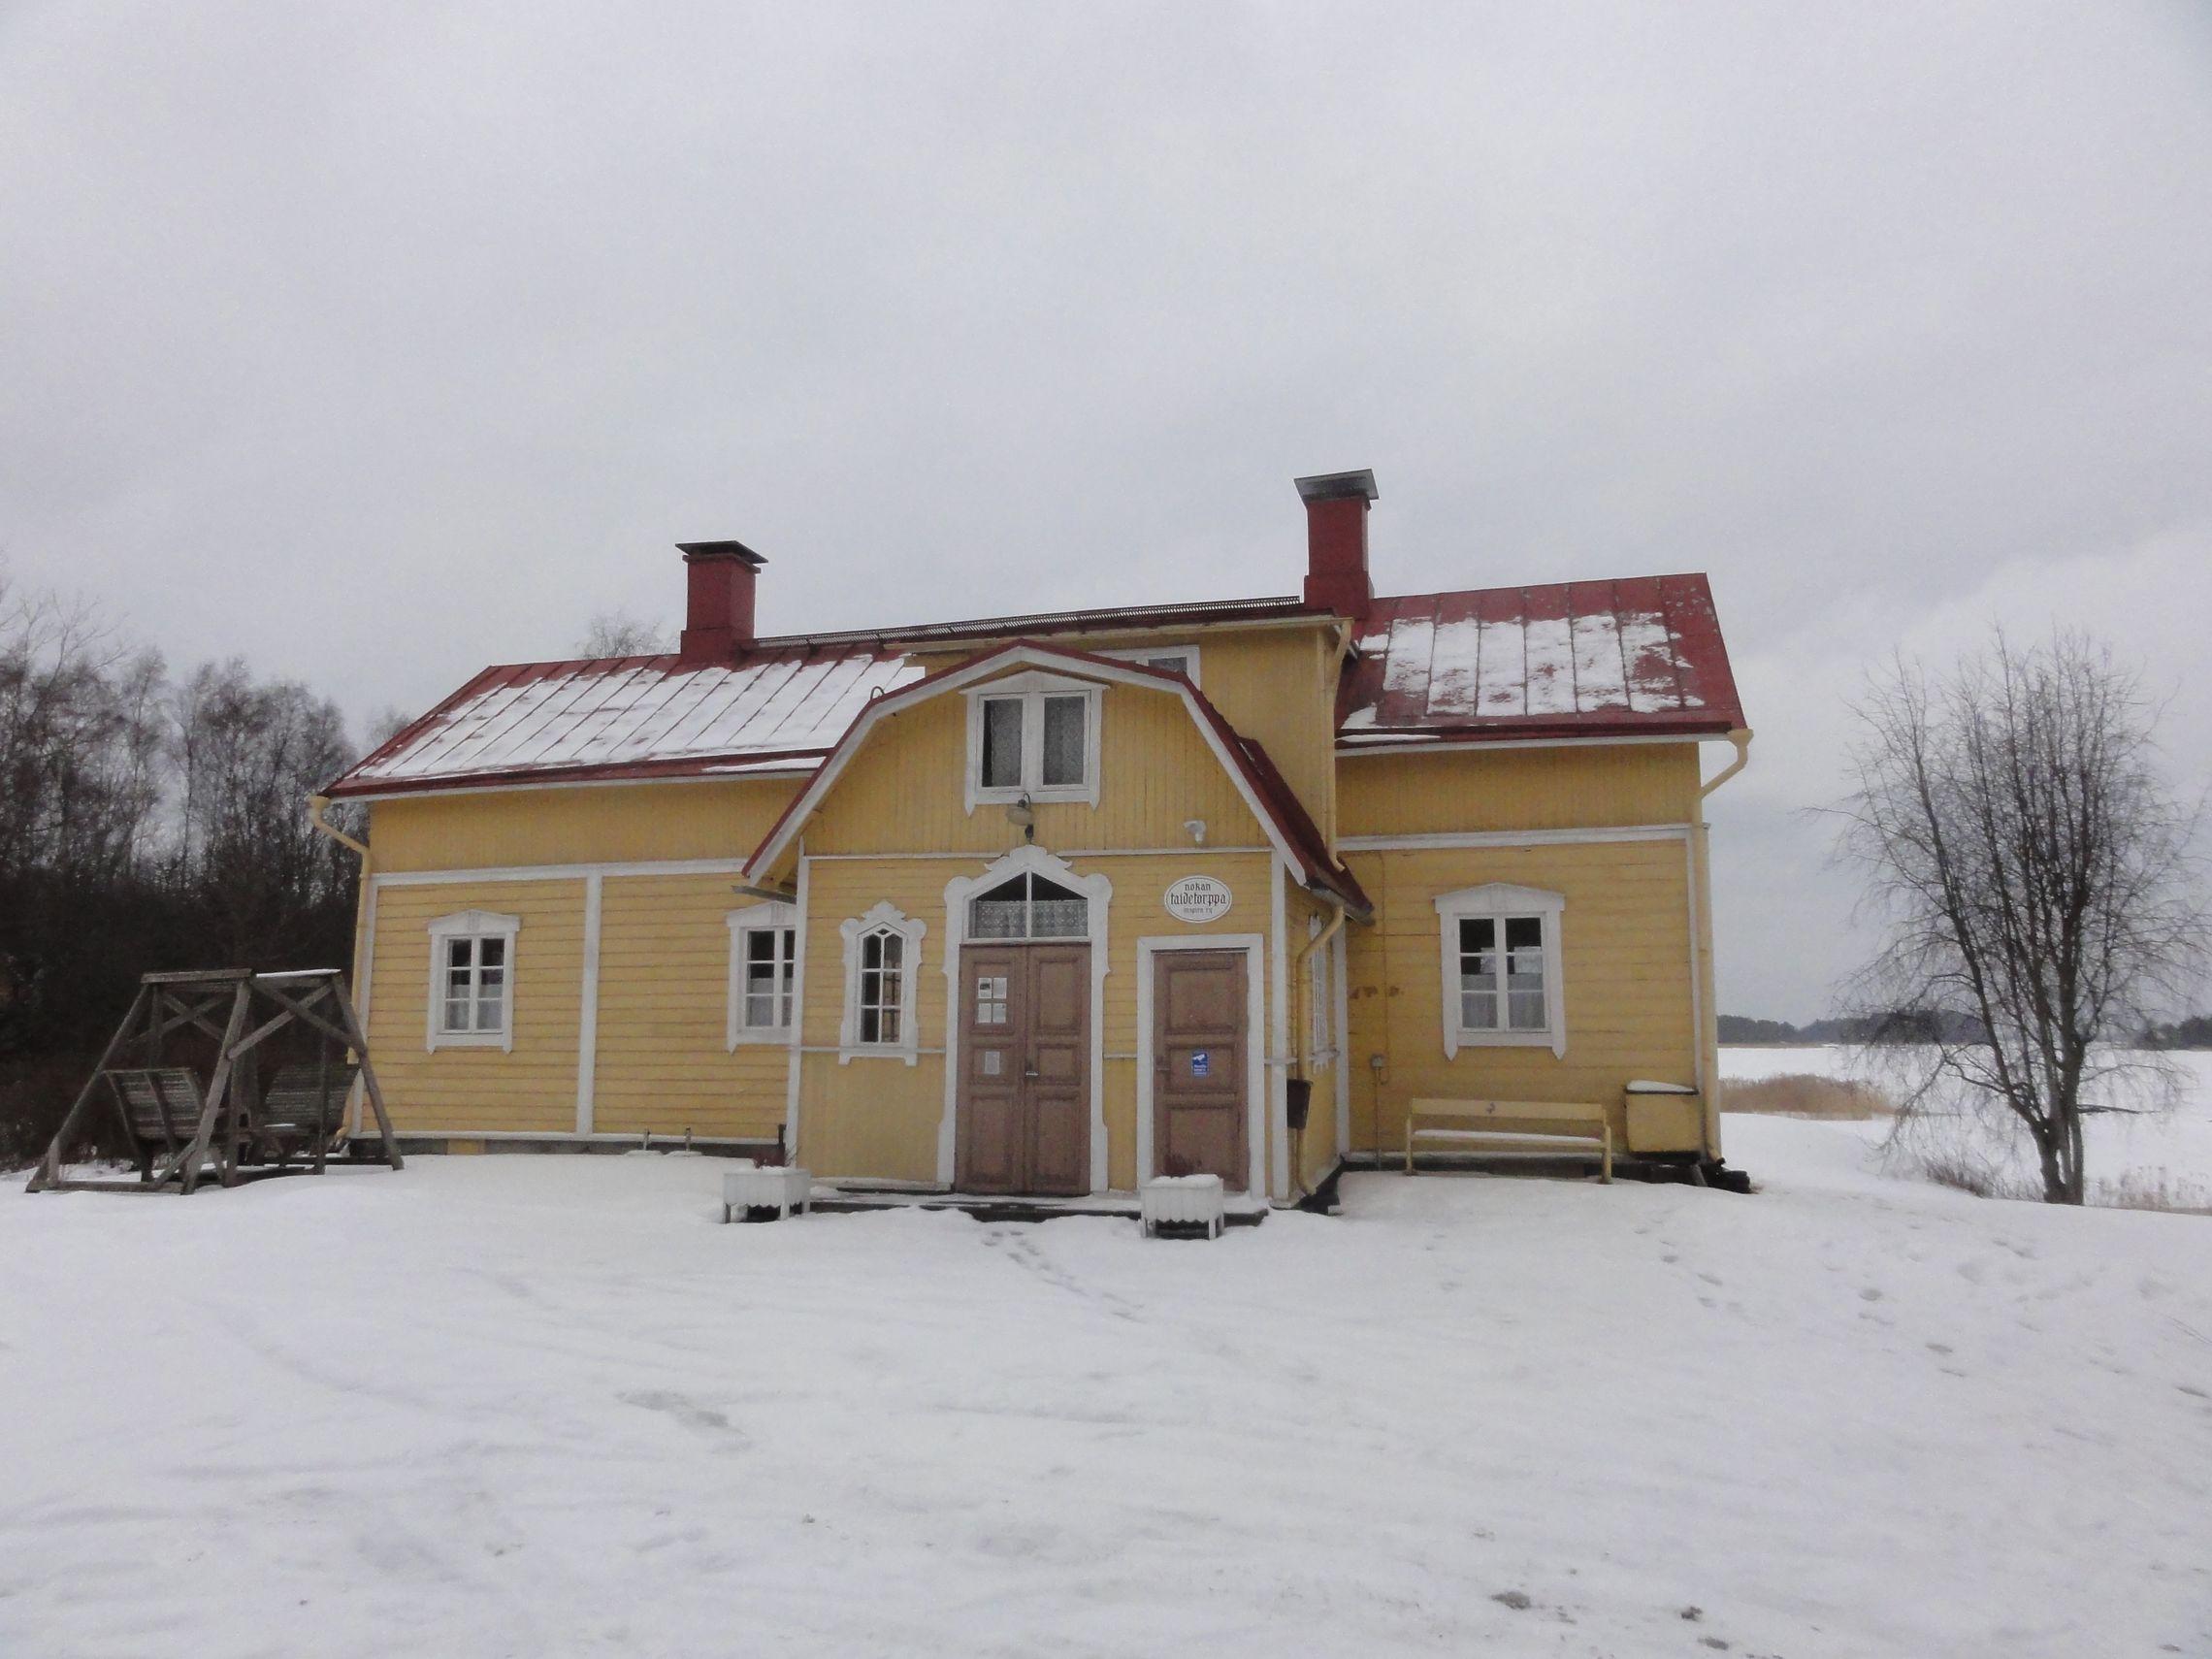 20180215 Plage Rauma 05